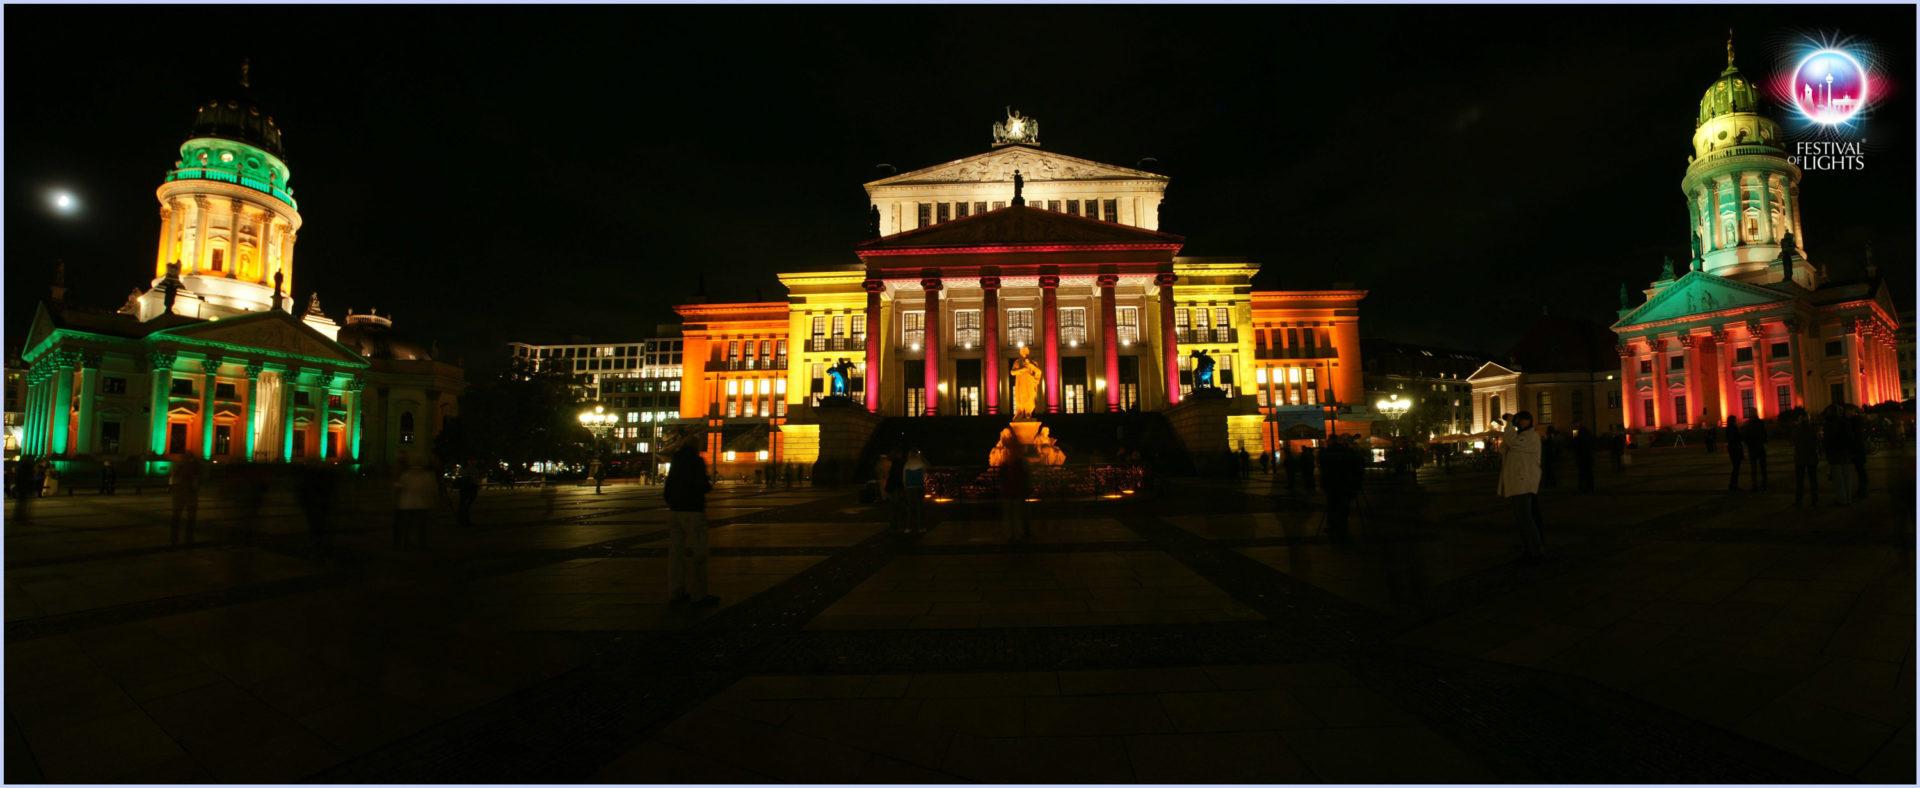 Gendarmenmarkt - 2010